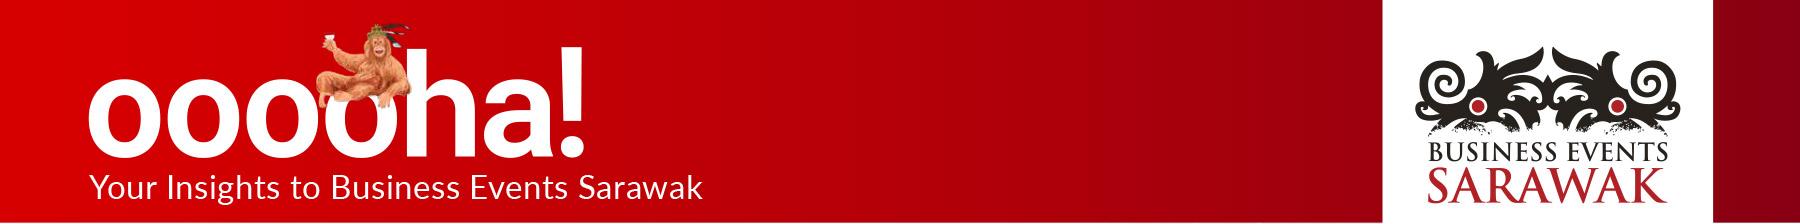 BESarawak Industry Related News – June 2021